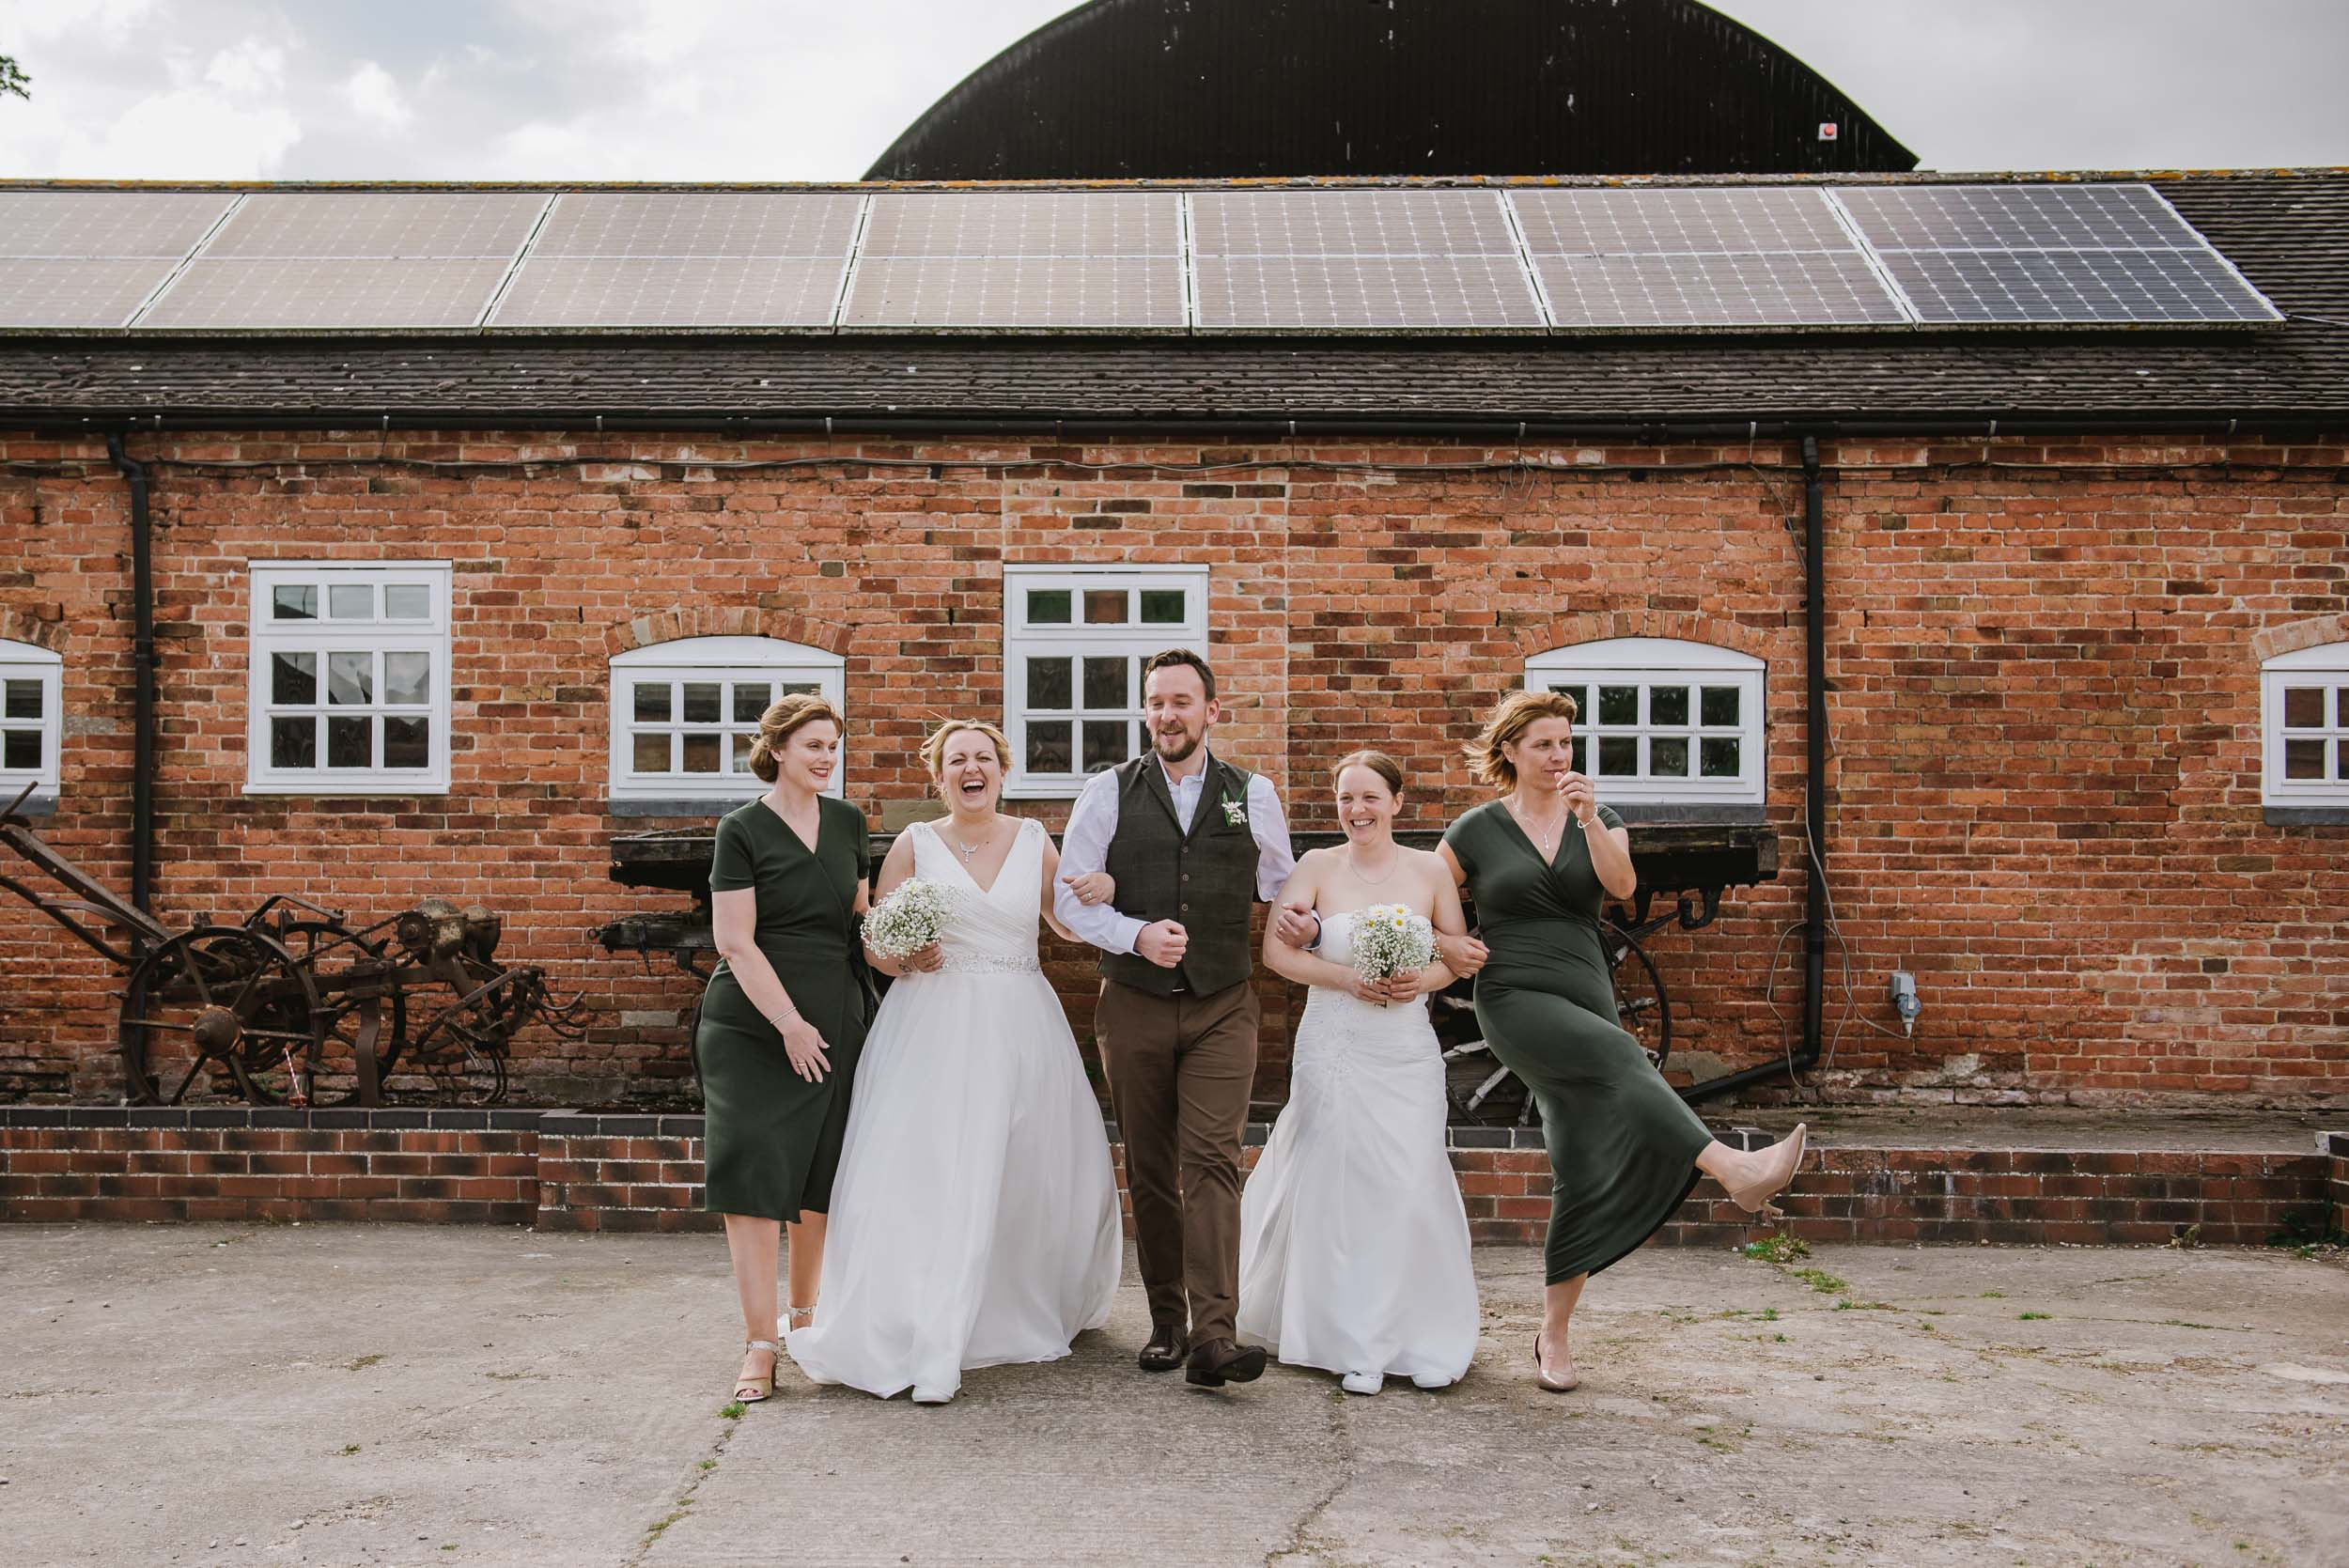 Donington-park-farm-wedding-photography-319.jpg